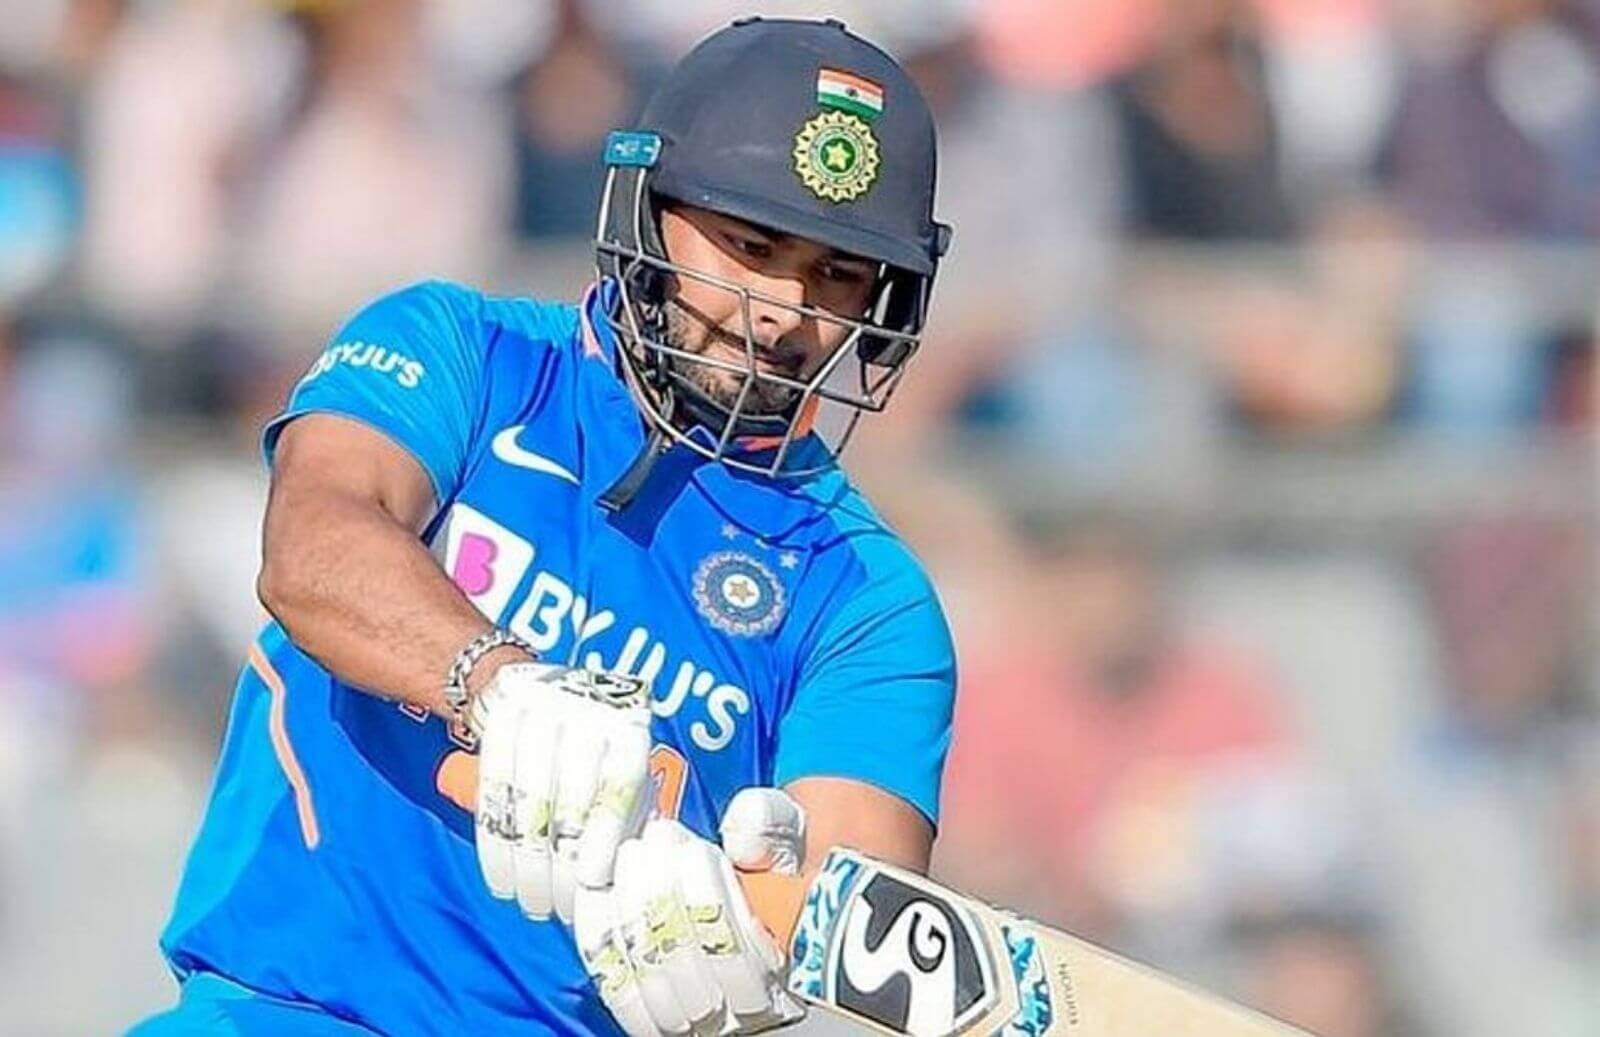 India vs Australia_ Sunil Gavaskar Picks Between Rishabh Pant And Wriddhiman Saha vs Australia For 1st Test